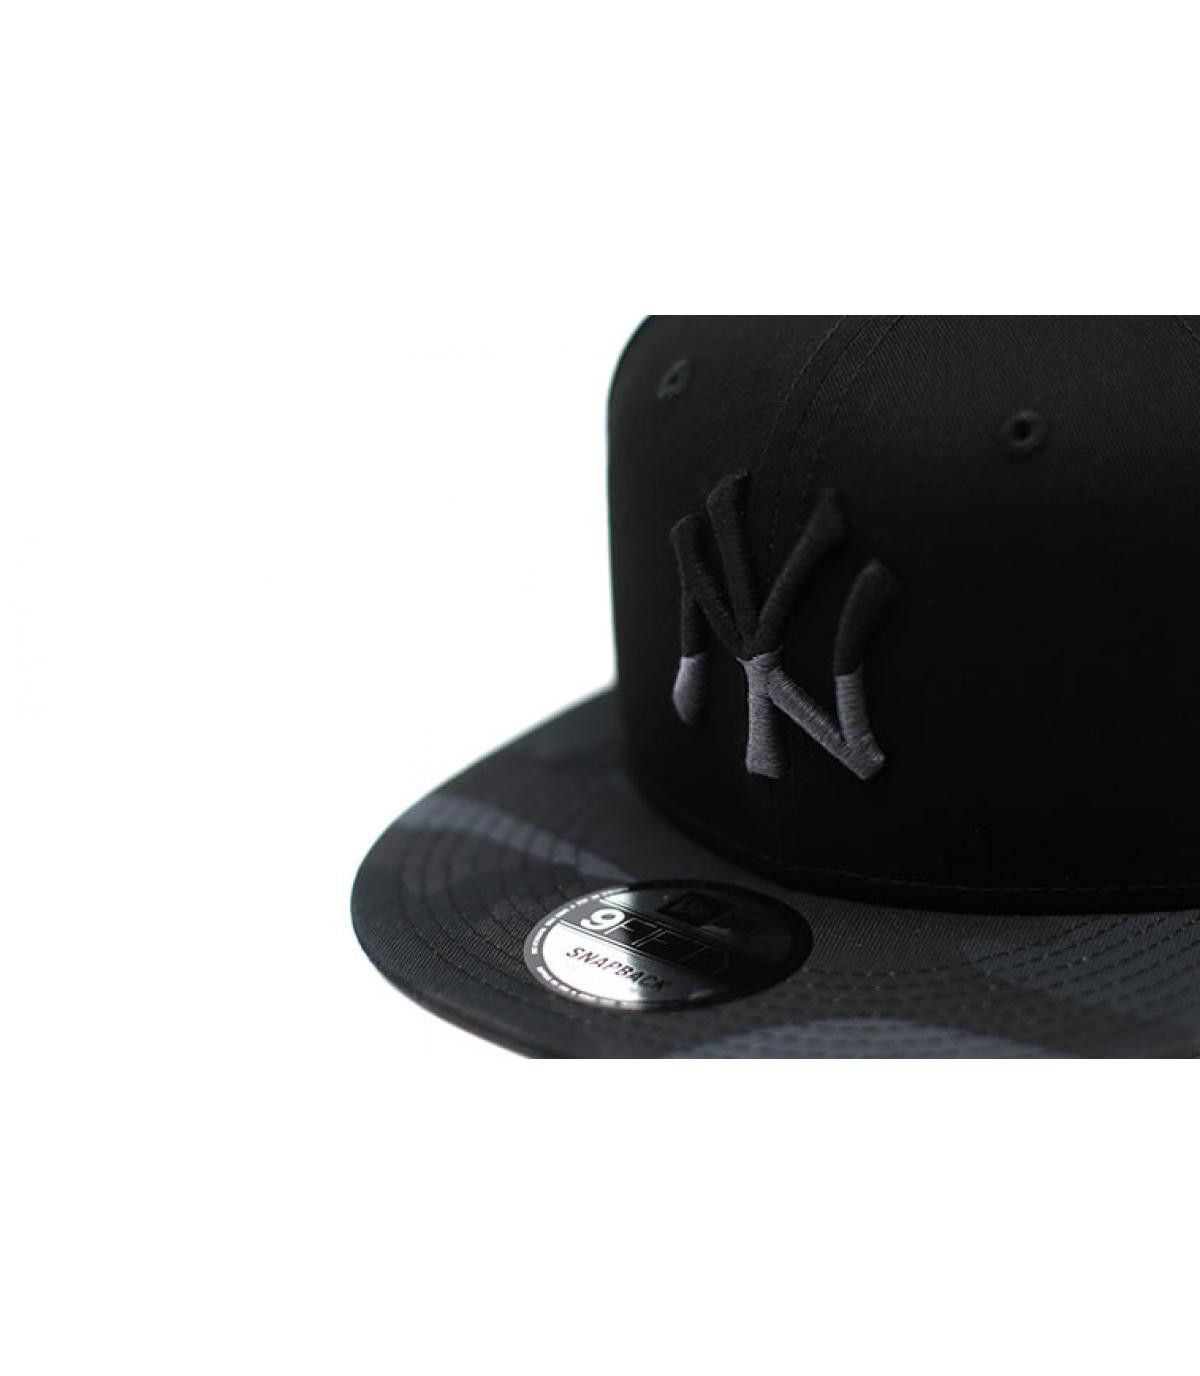 Détails Snapback Camo Ess NY 9Fifty black moody - image 3